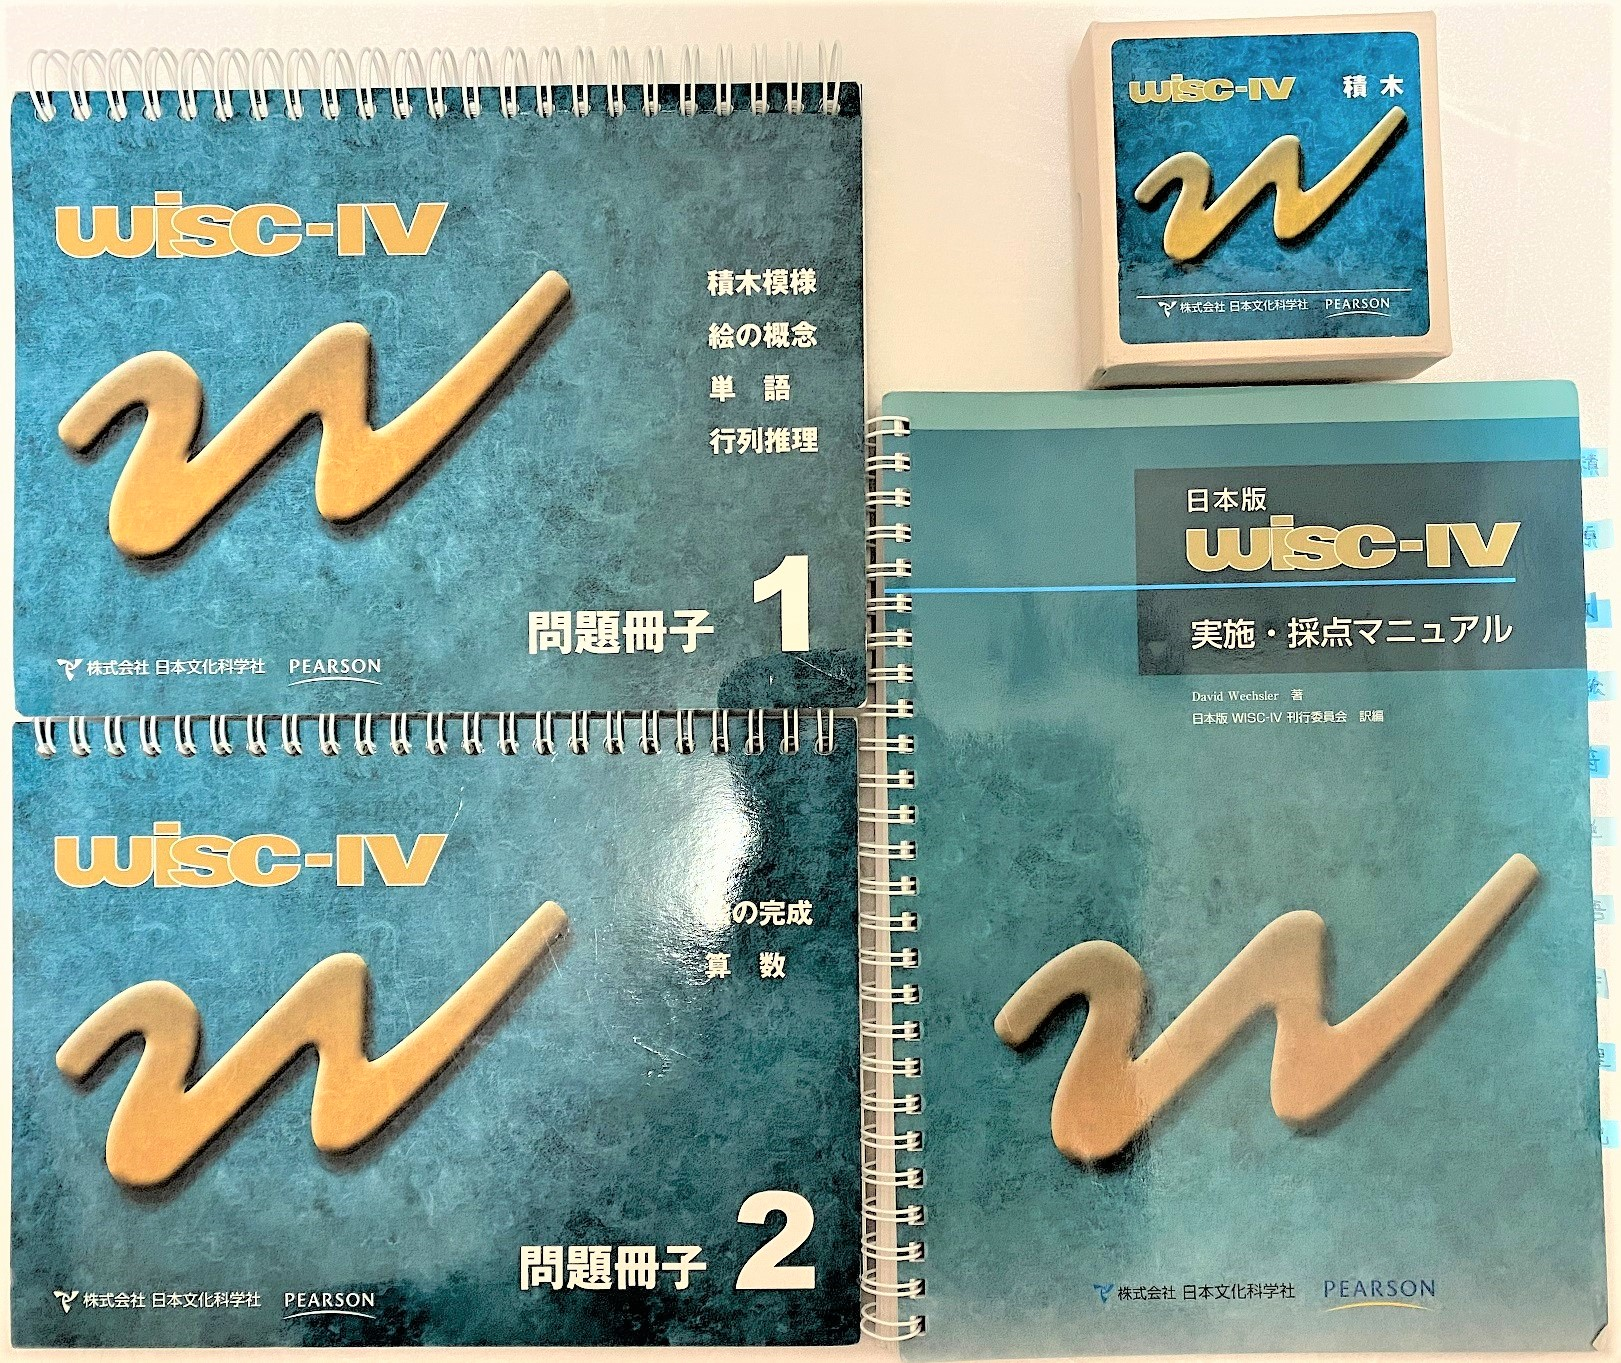 038【WISC-Ⅳ】WISC4(ウィスク4)検査と就労について